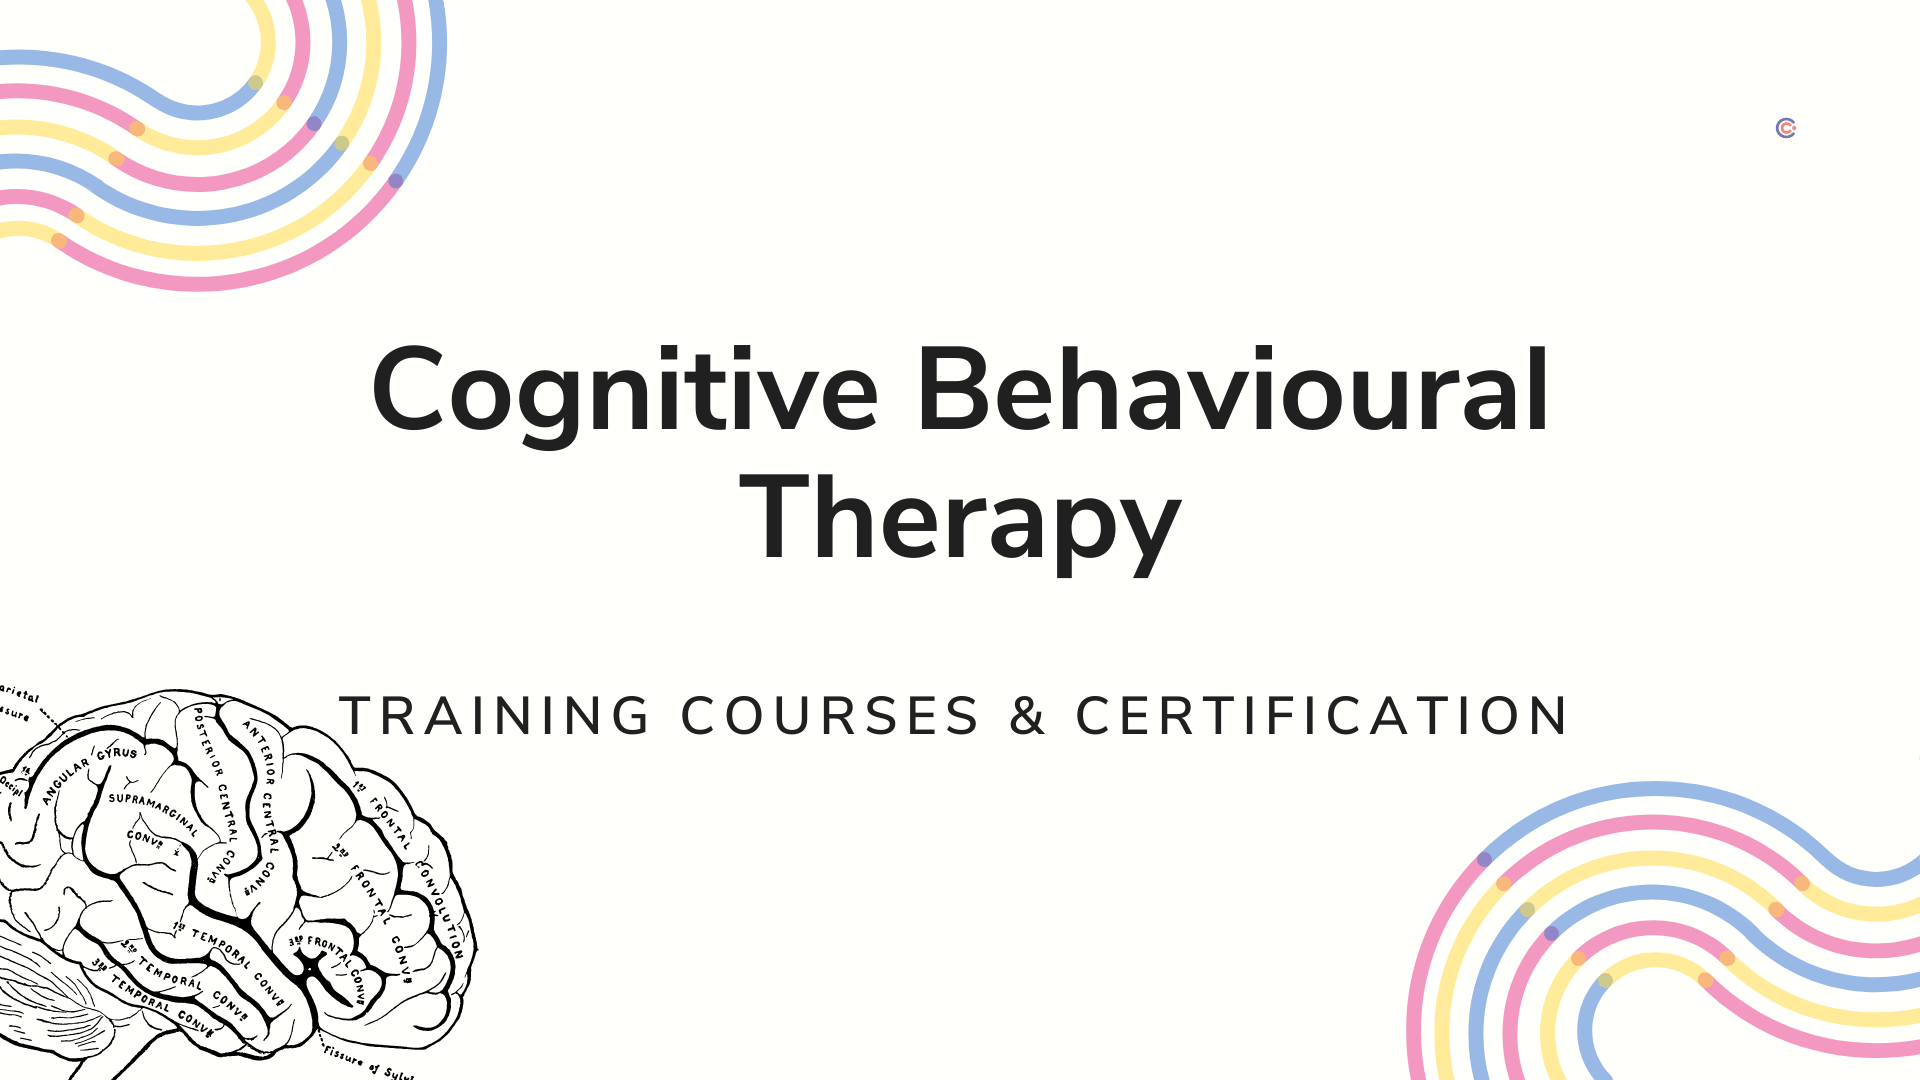 5 Best CBT Training Courses & Certification - Learn CBT Online